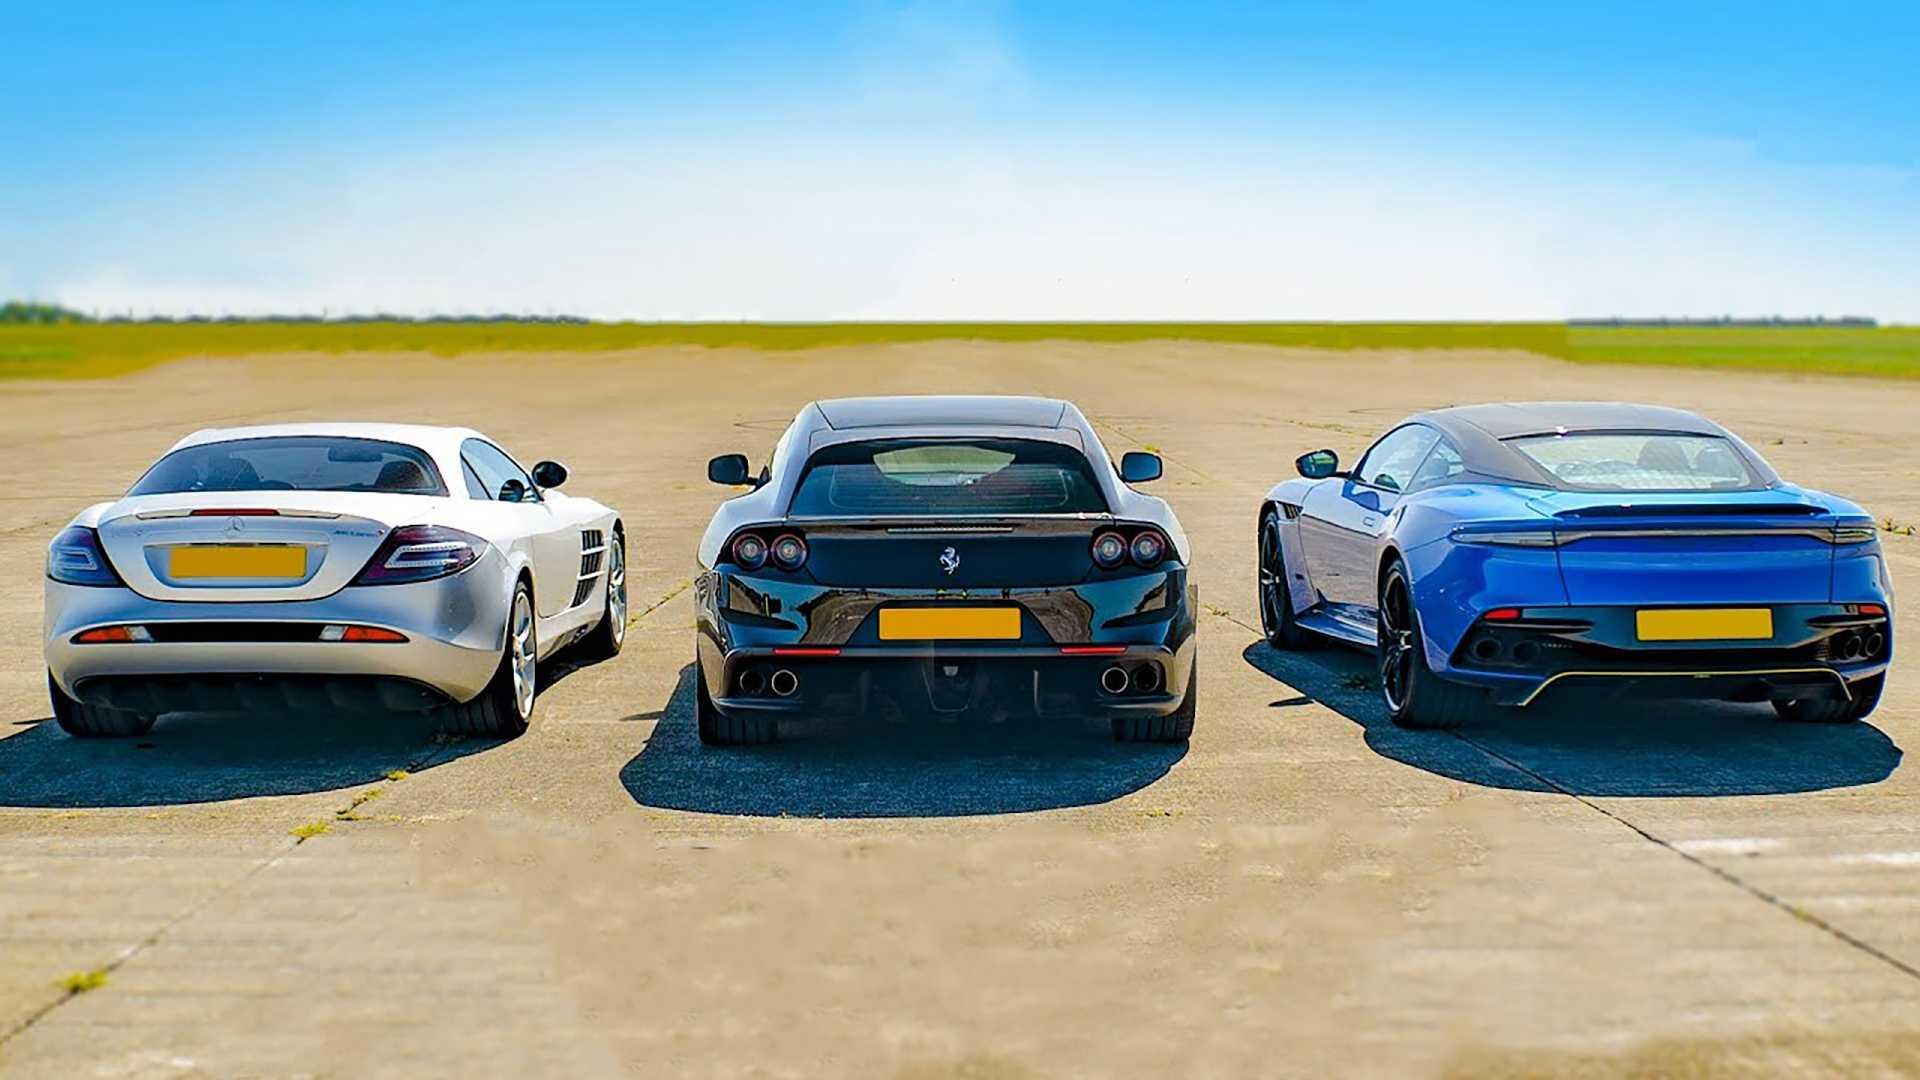 SLR McLaren vs Ferrari GTC4 i Aston Martin DBS